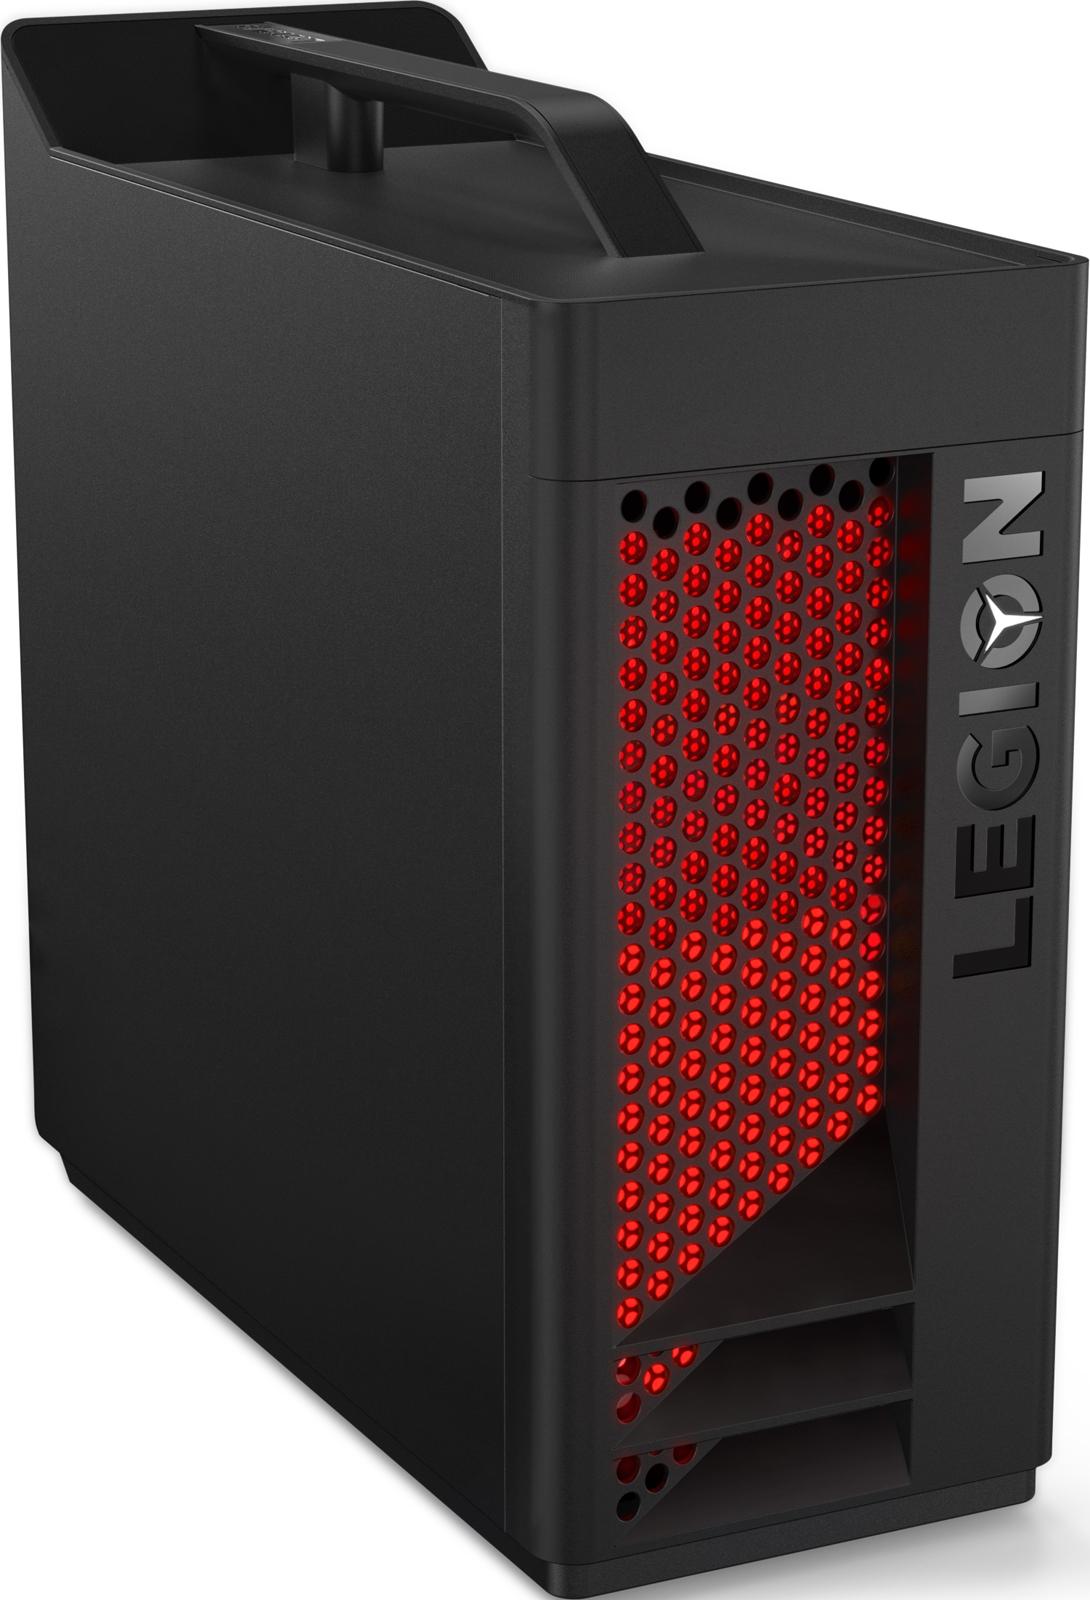 Системный блок Lenovo Legion T530-28ICB MT, 90JL007ERS, черный lenovo legion t530 28icb 90jl007ers черный